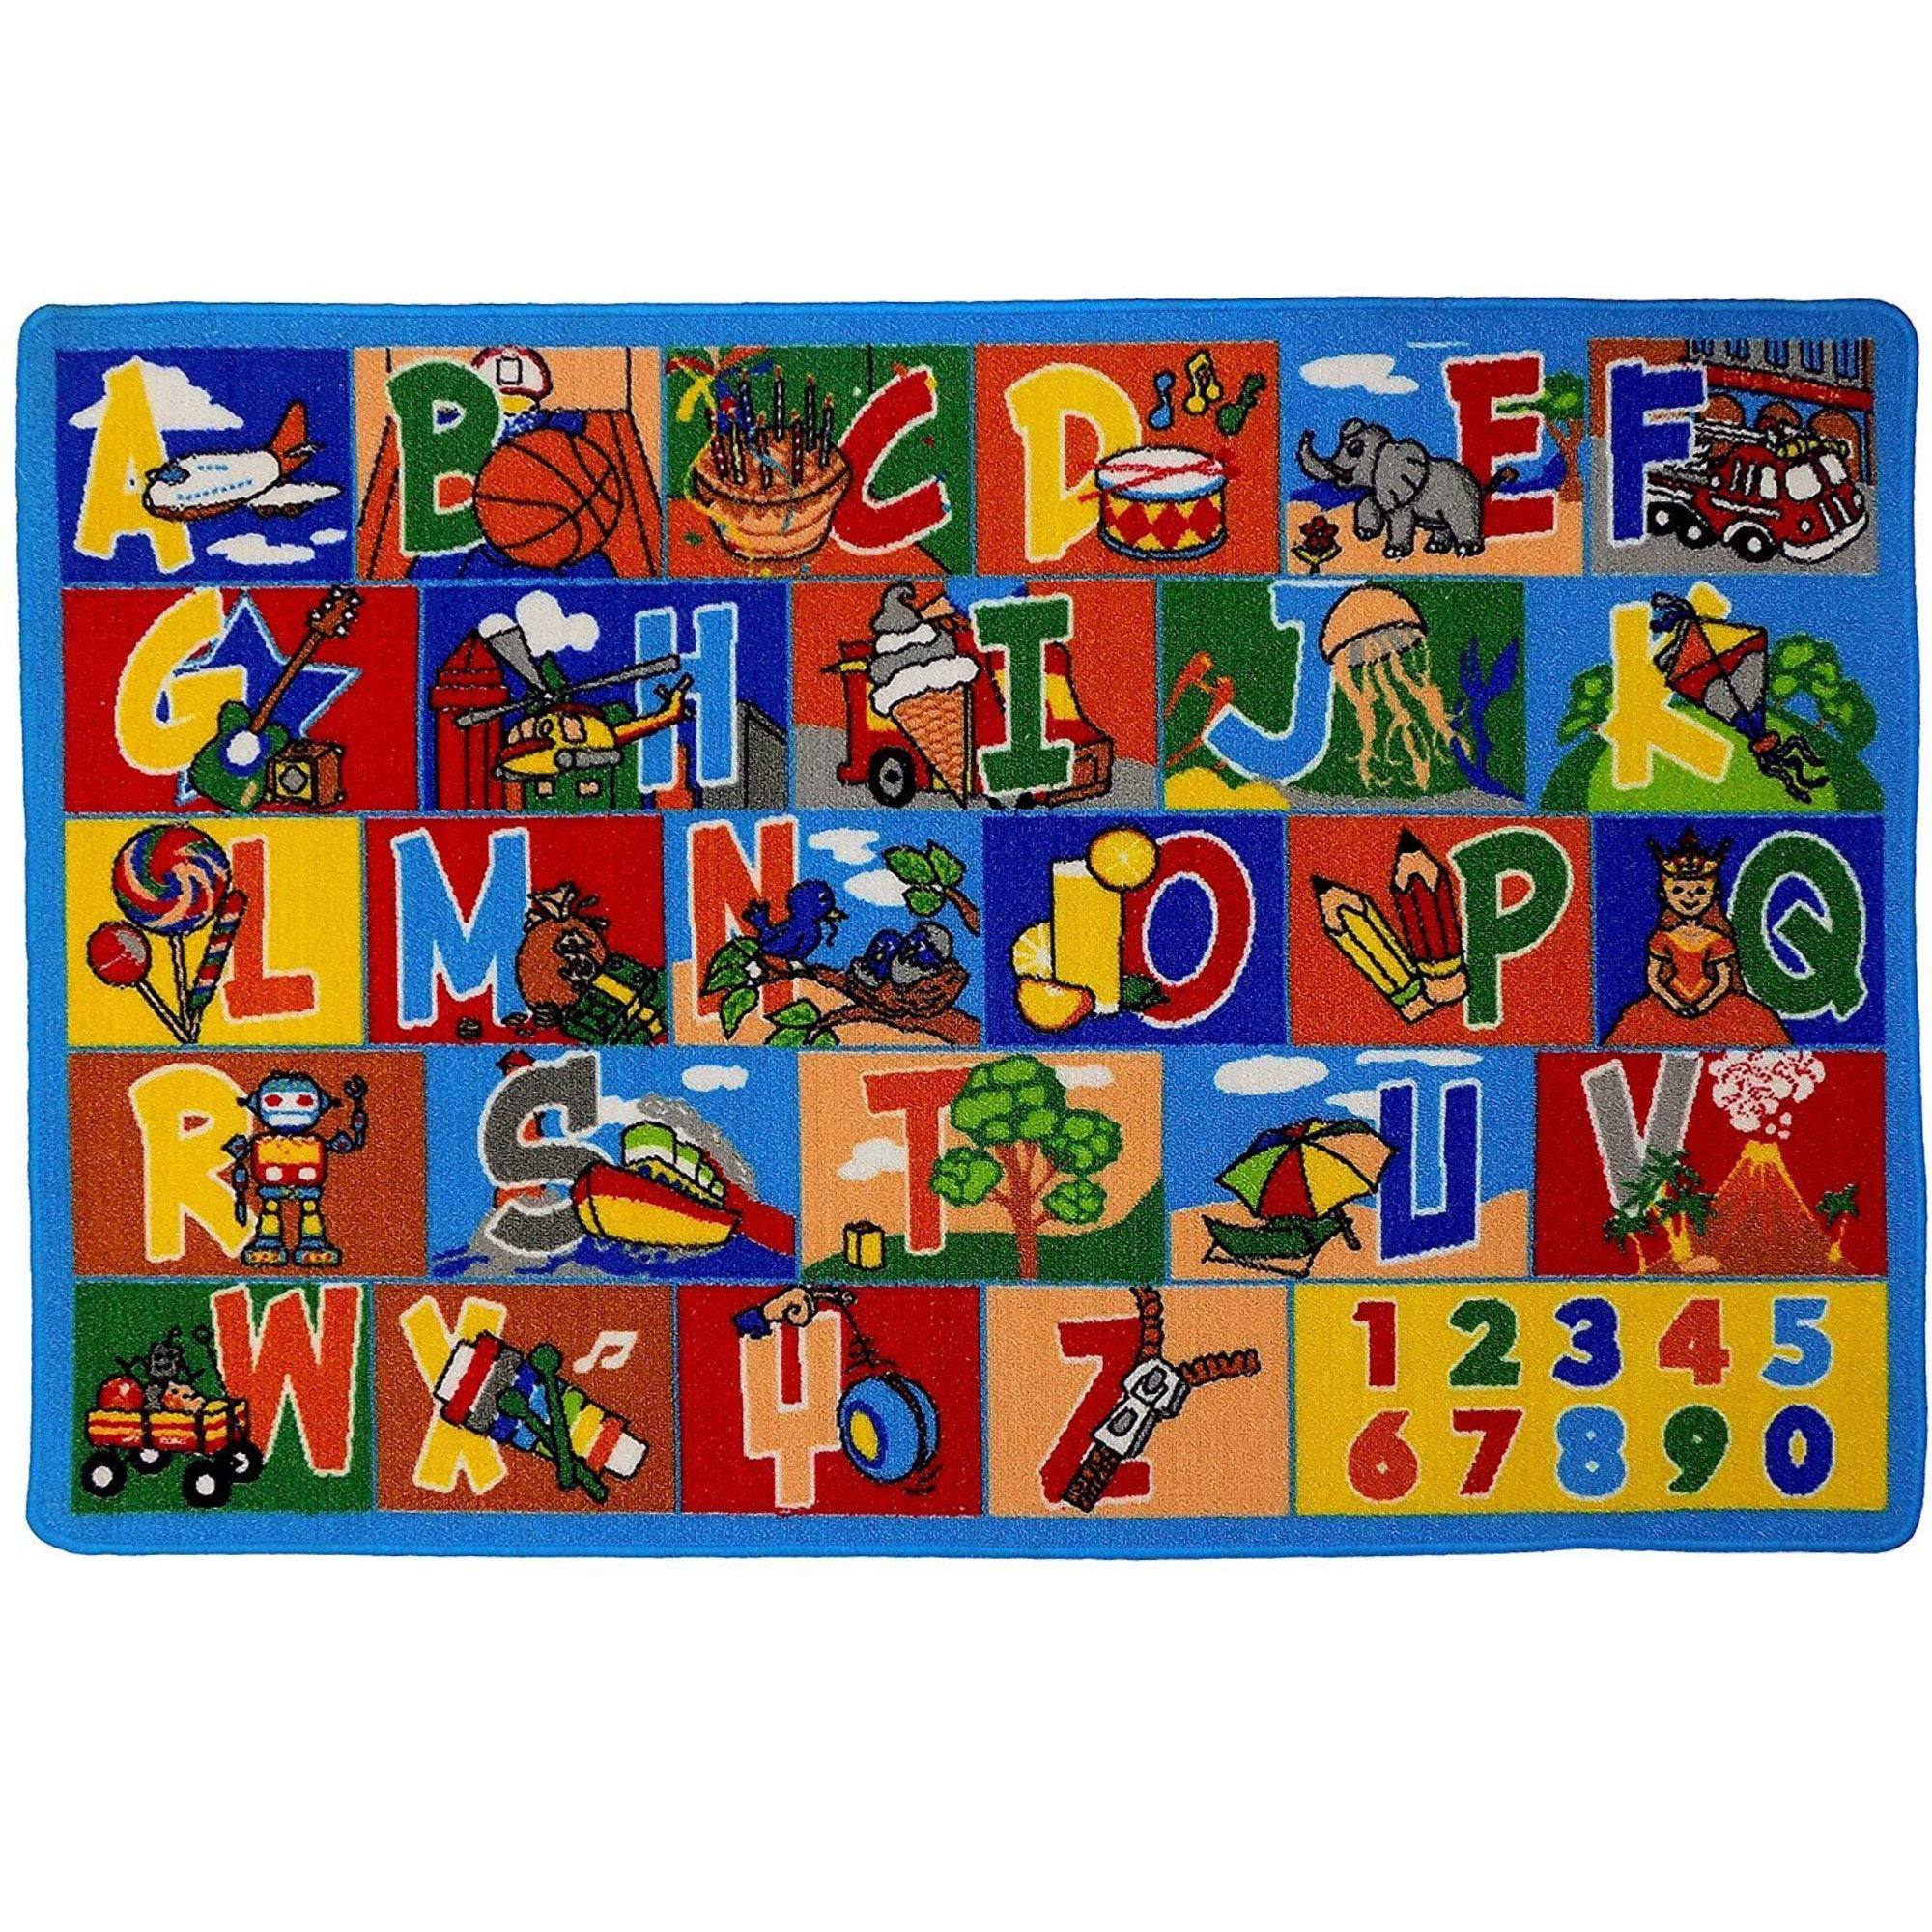 Mybecca Kids Rug ABC-1 Numbers 8 x 10 Children's Educational Learning Rug 7' feet 2'' inch 10' ft (7'2'' X 10') by Mybecca